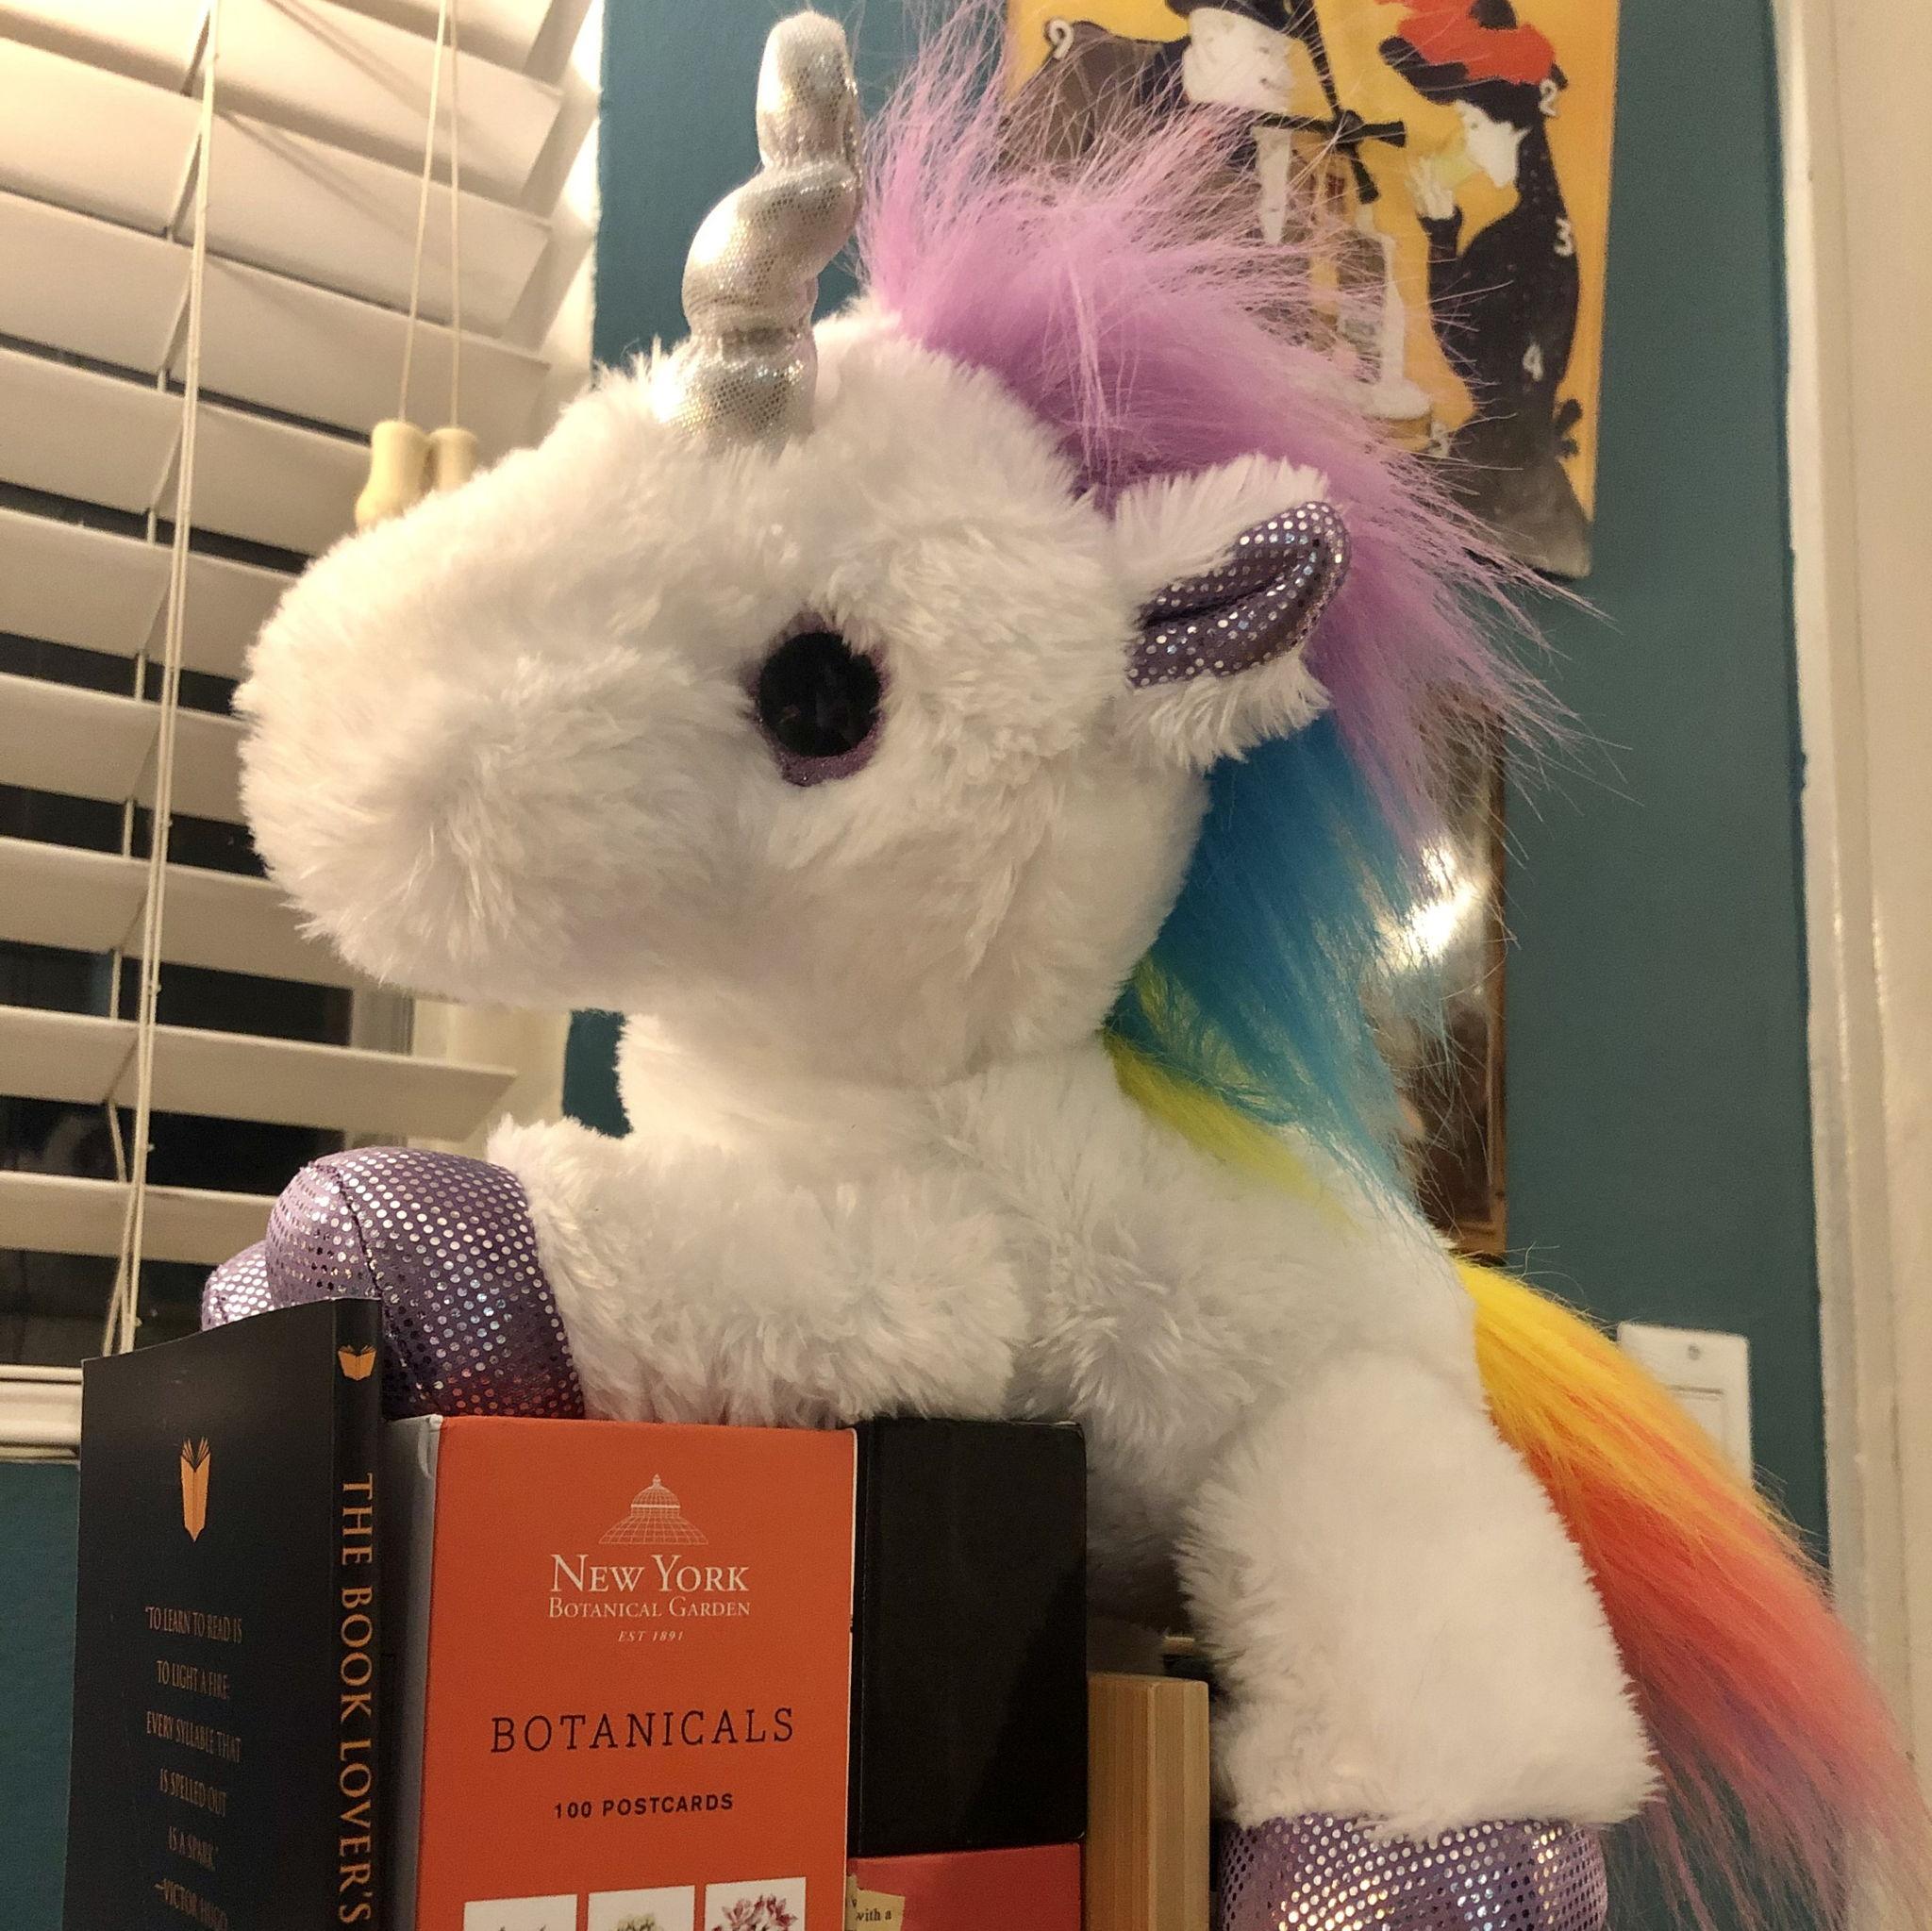 A plush Unicorn sitting on a pile of books.